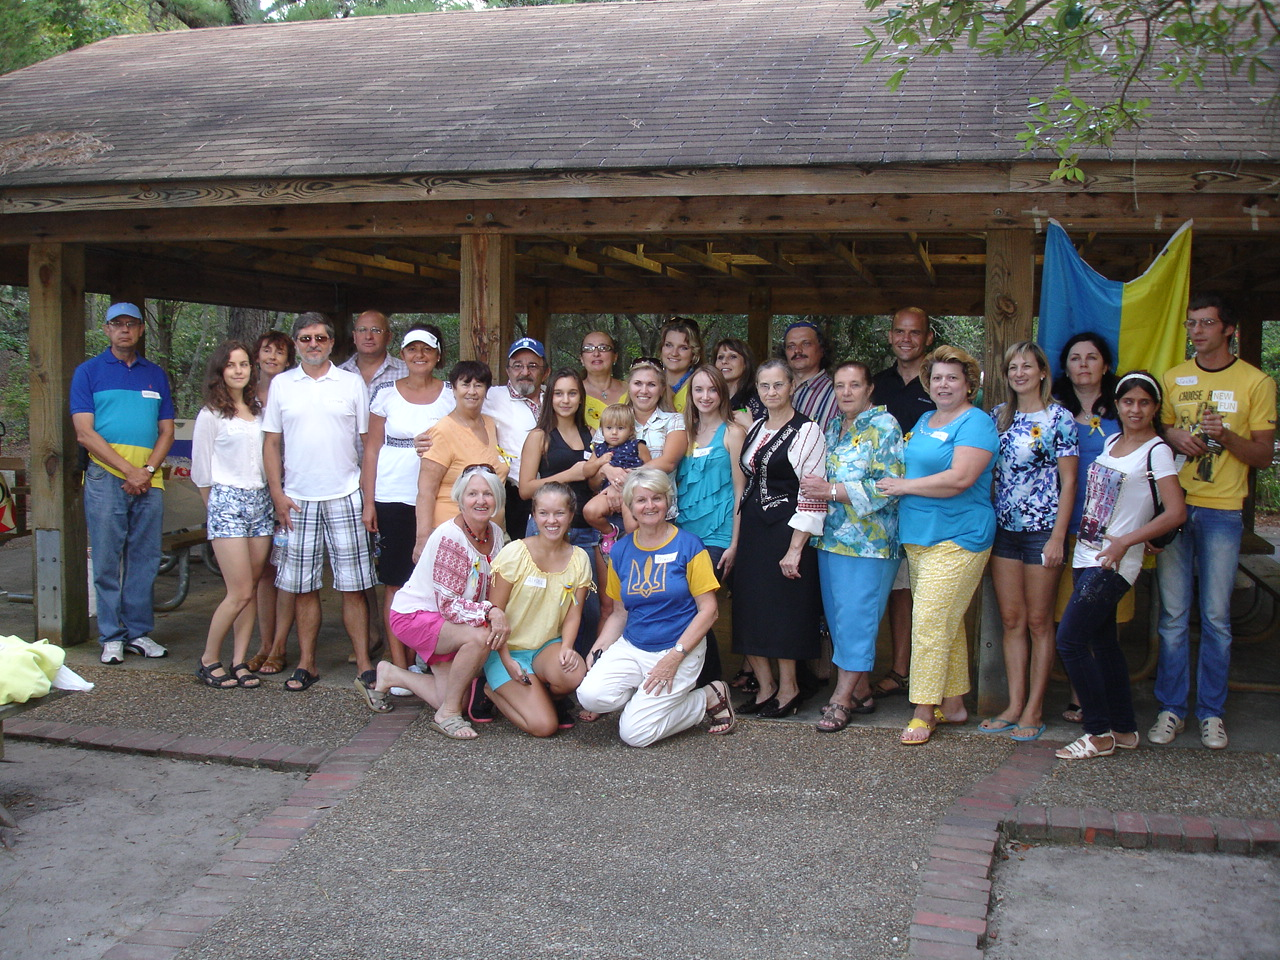 Ukrainian Independence Day group photo.